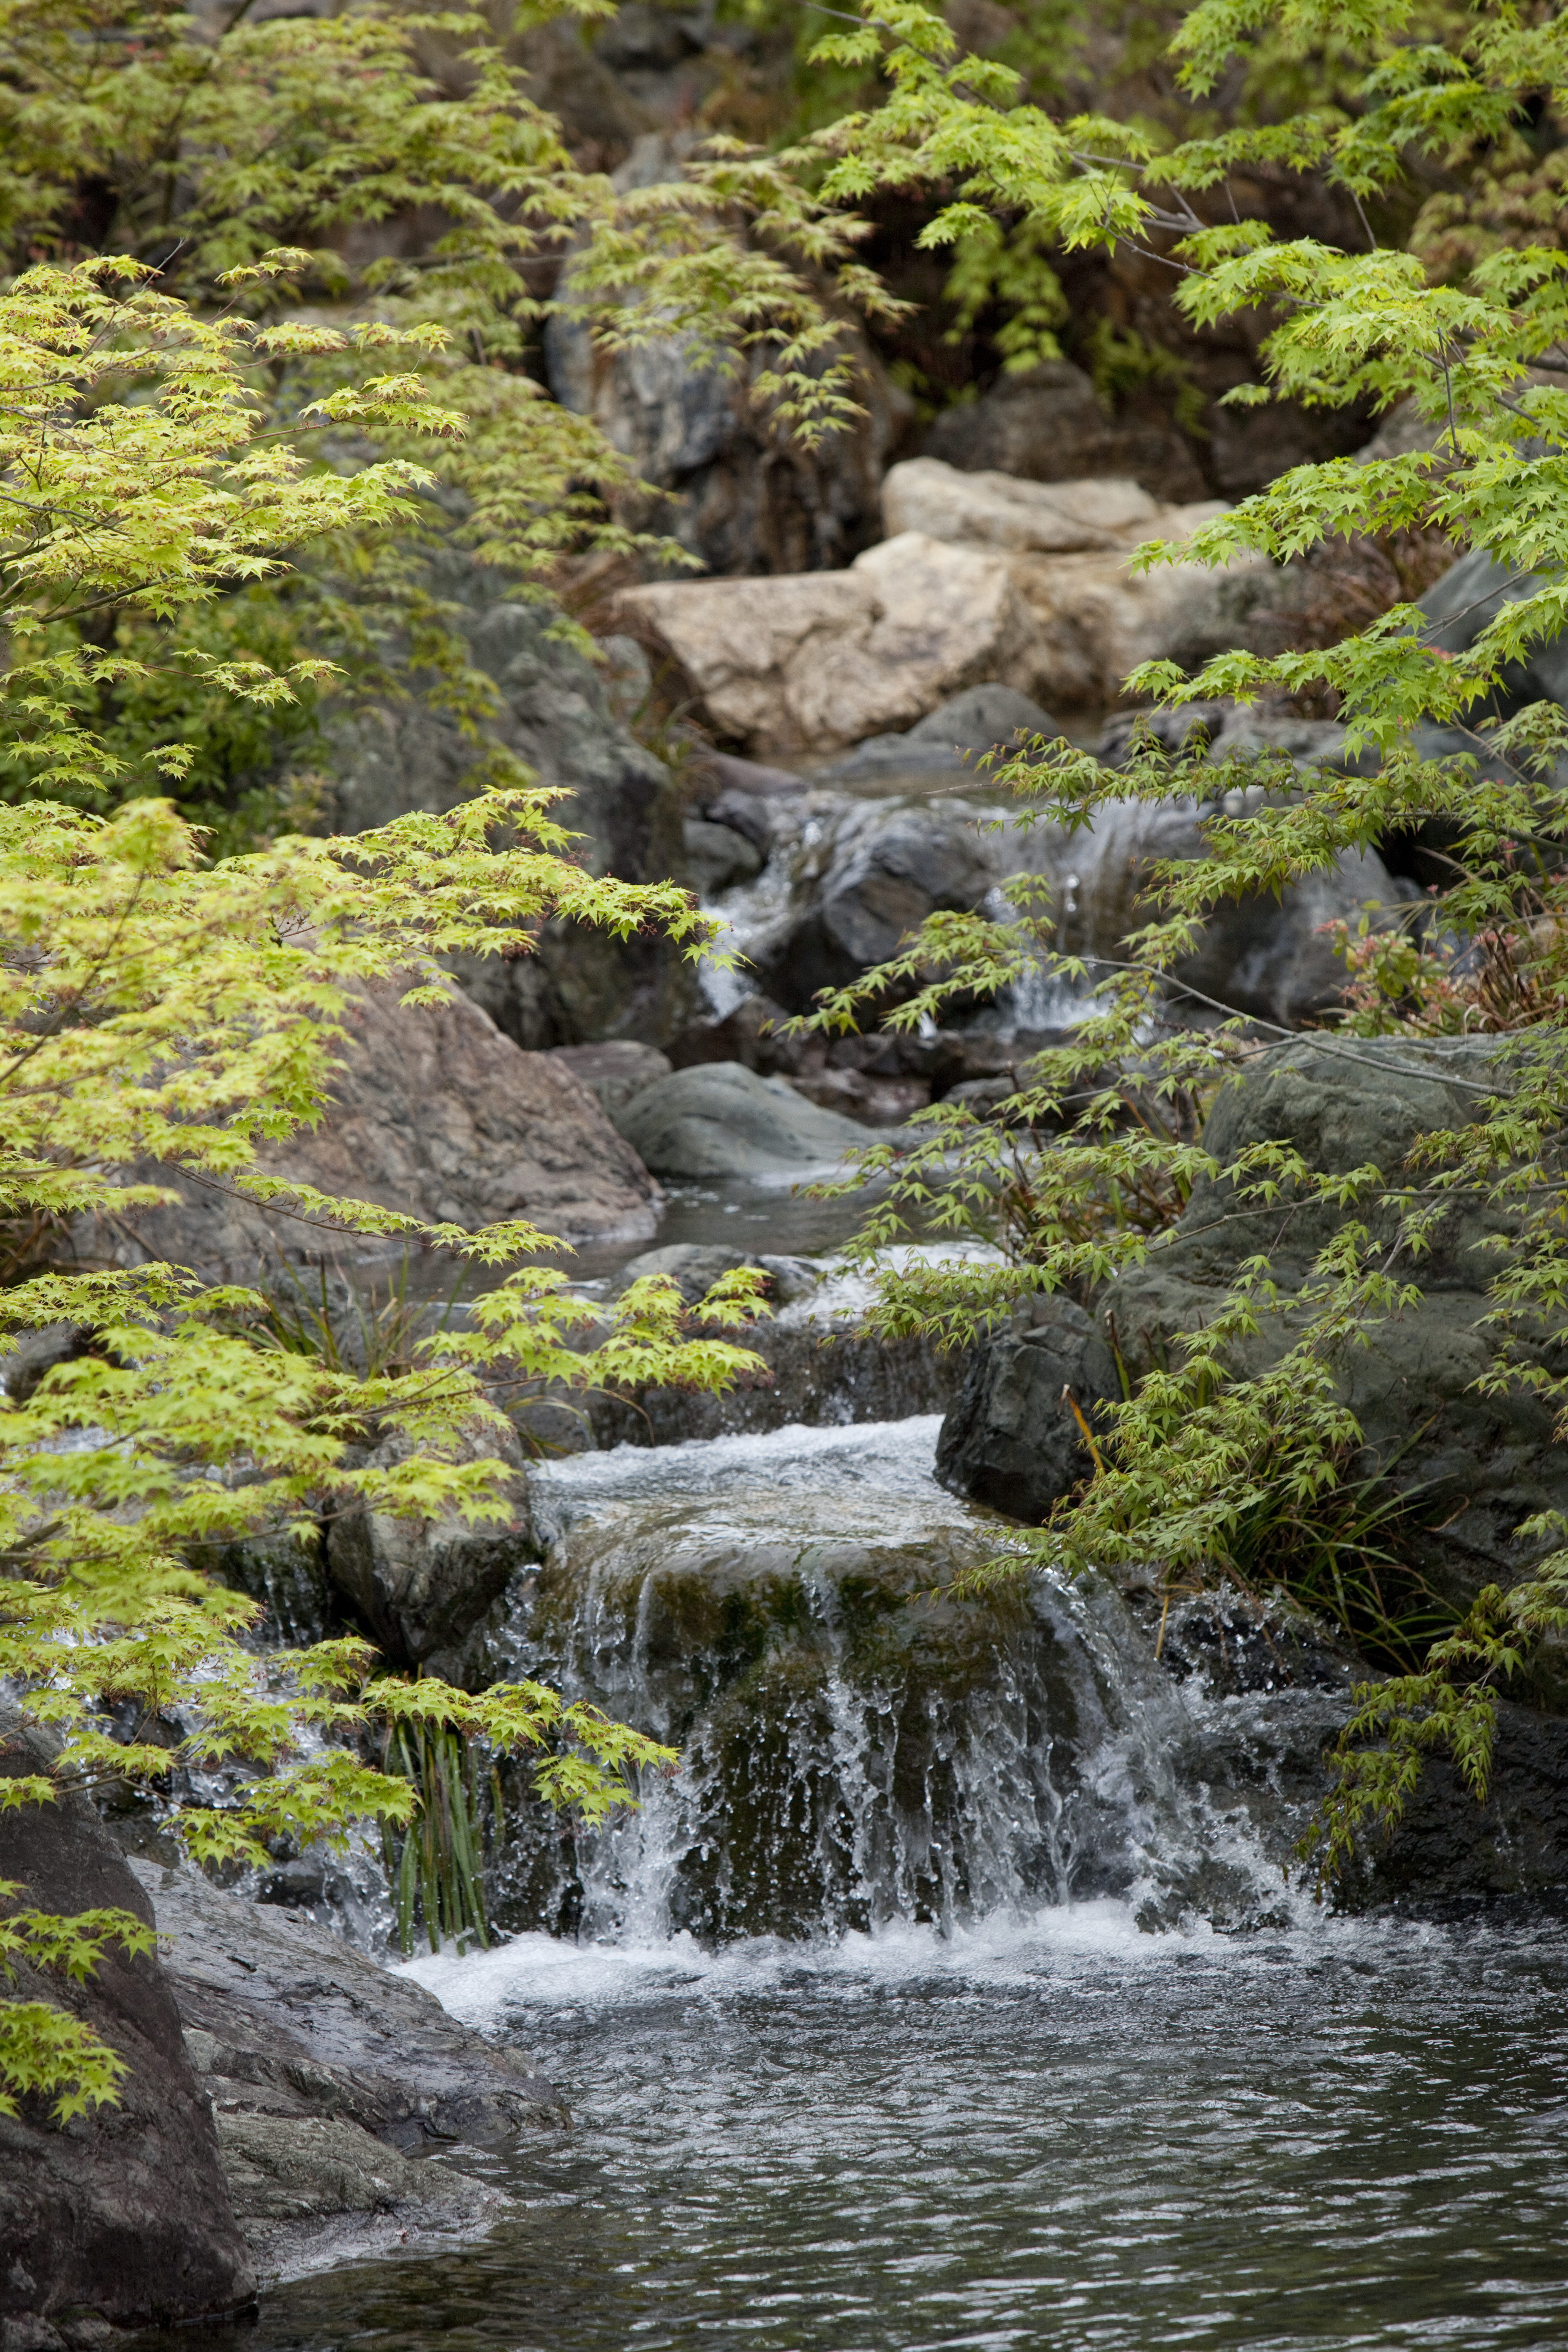 伏見稲荷大社・社務所庭園の画像